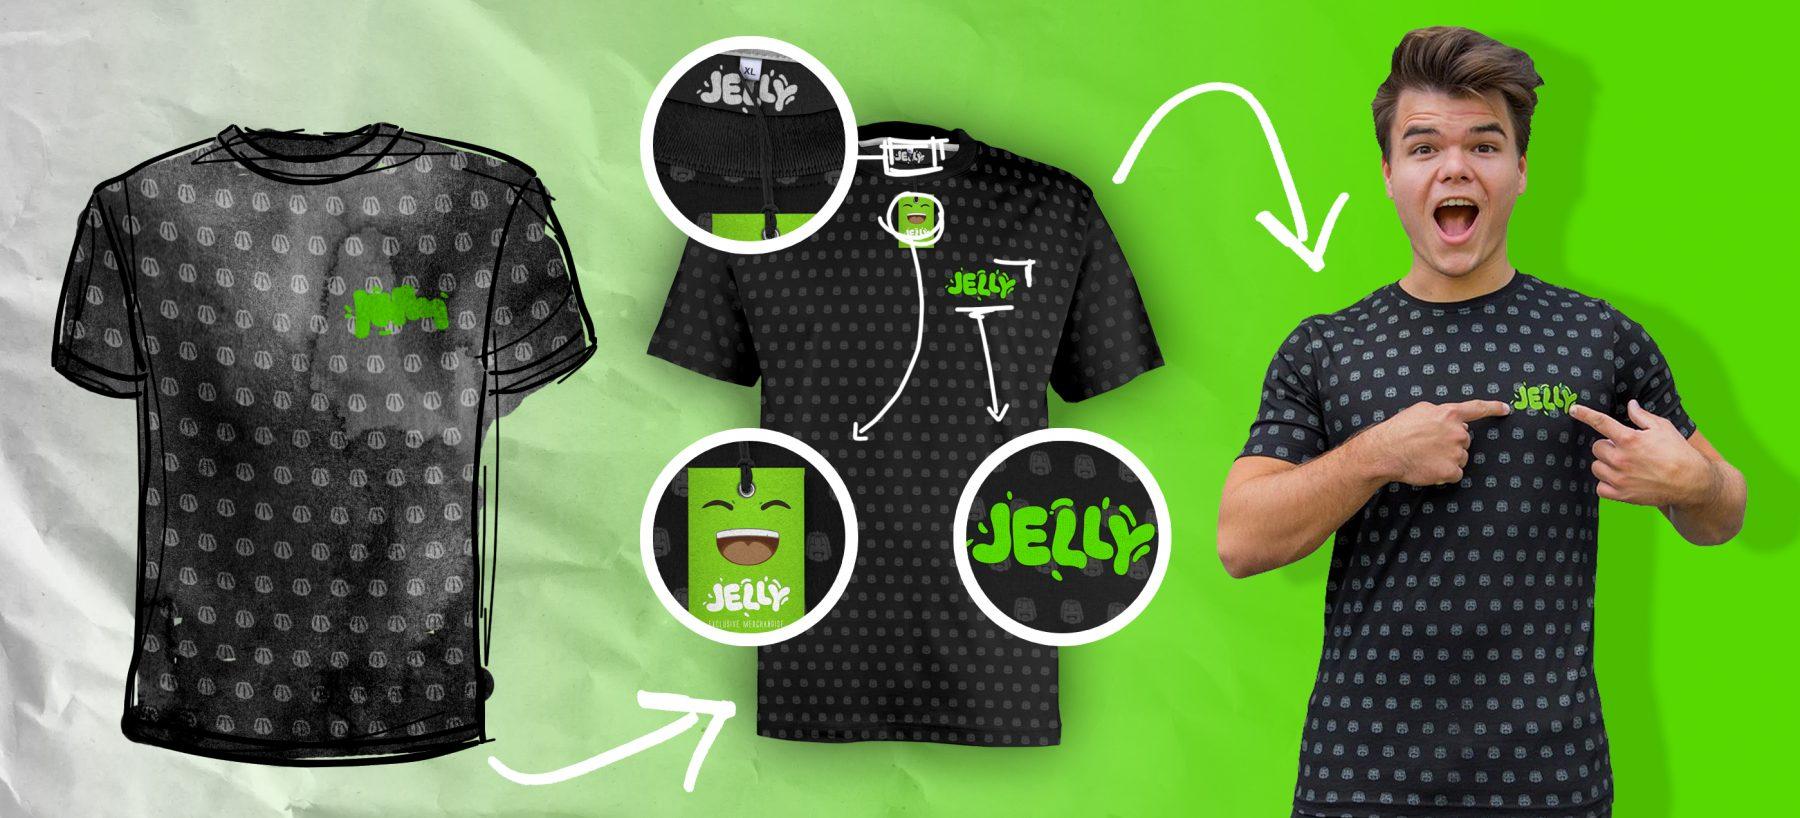 Custom Made T Shirts For Youtube Star Jelly Merchsupply Com